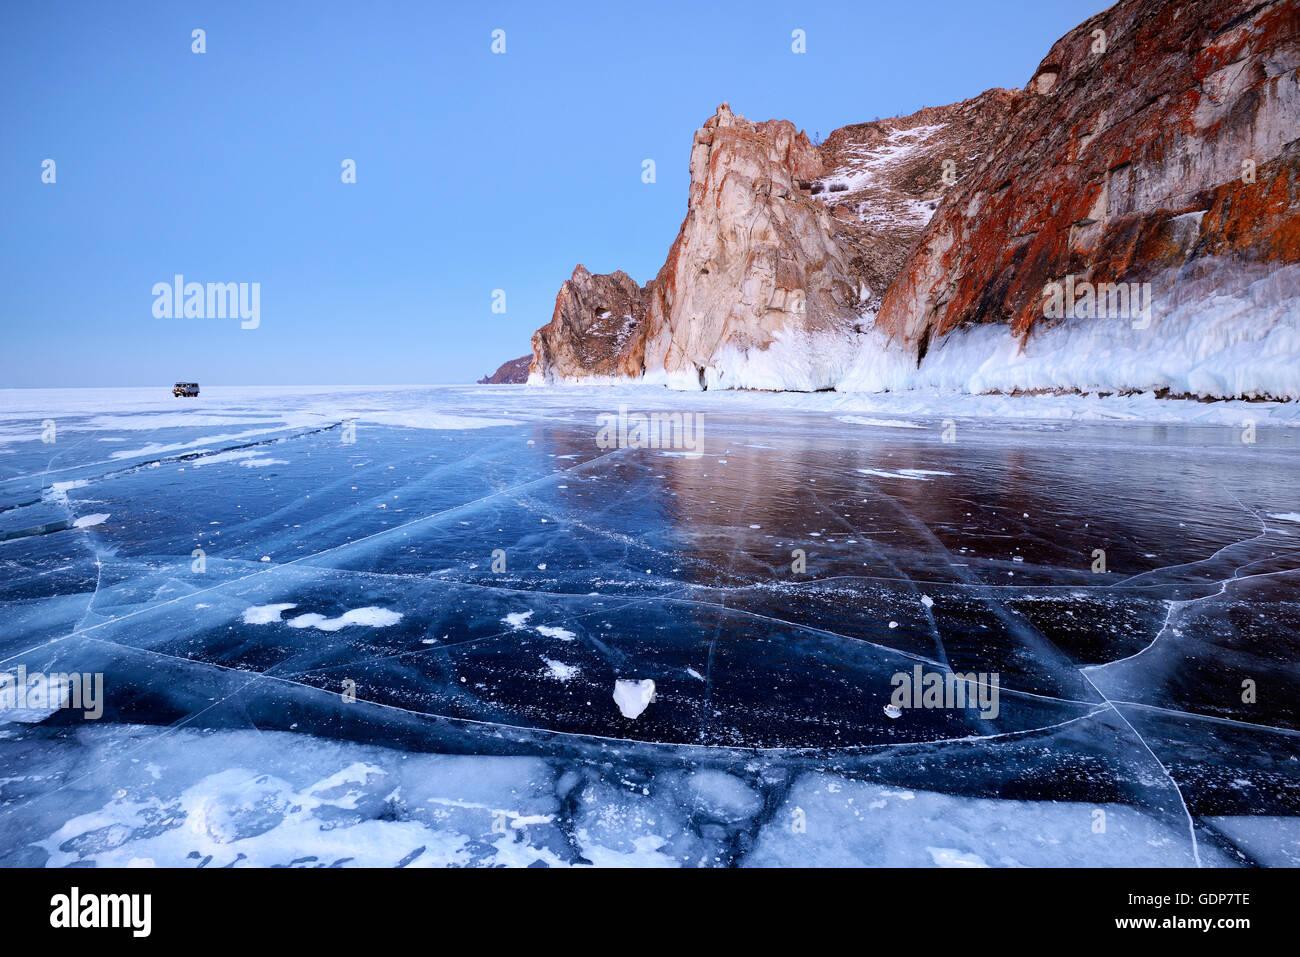 Kap Sagan-Khushun und drei Brüder Rock, Baikalsee, Olchon, Sibirien, Russland Stockbild